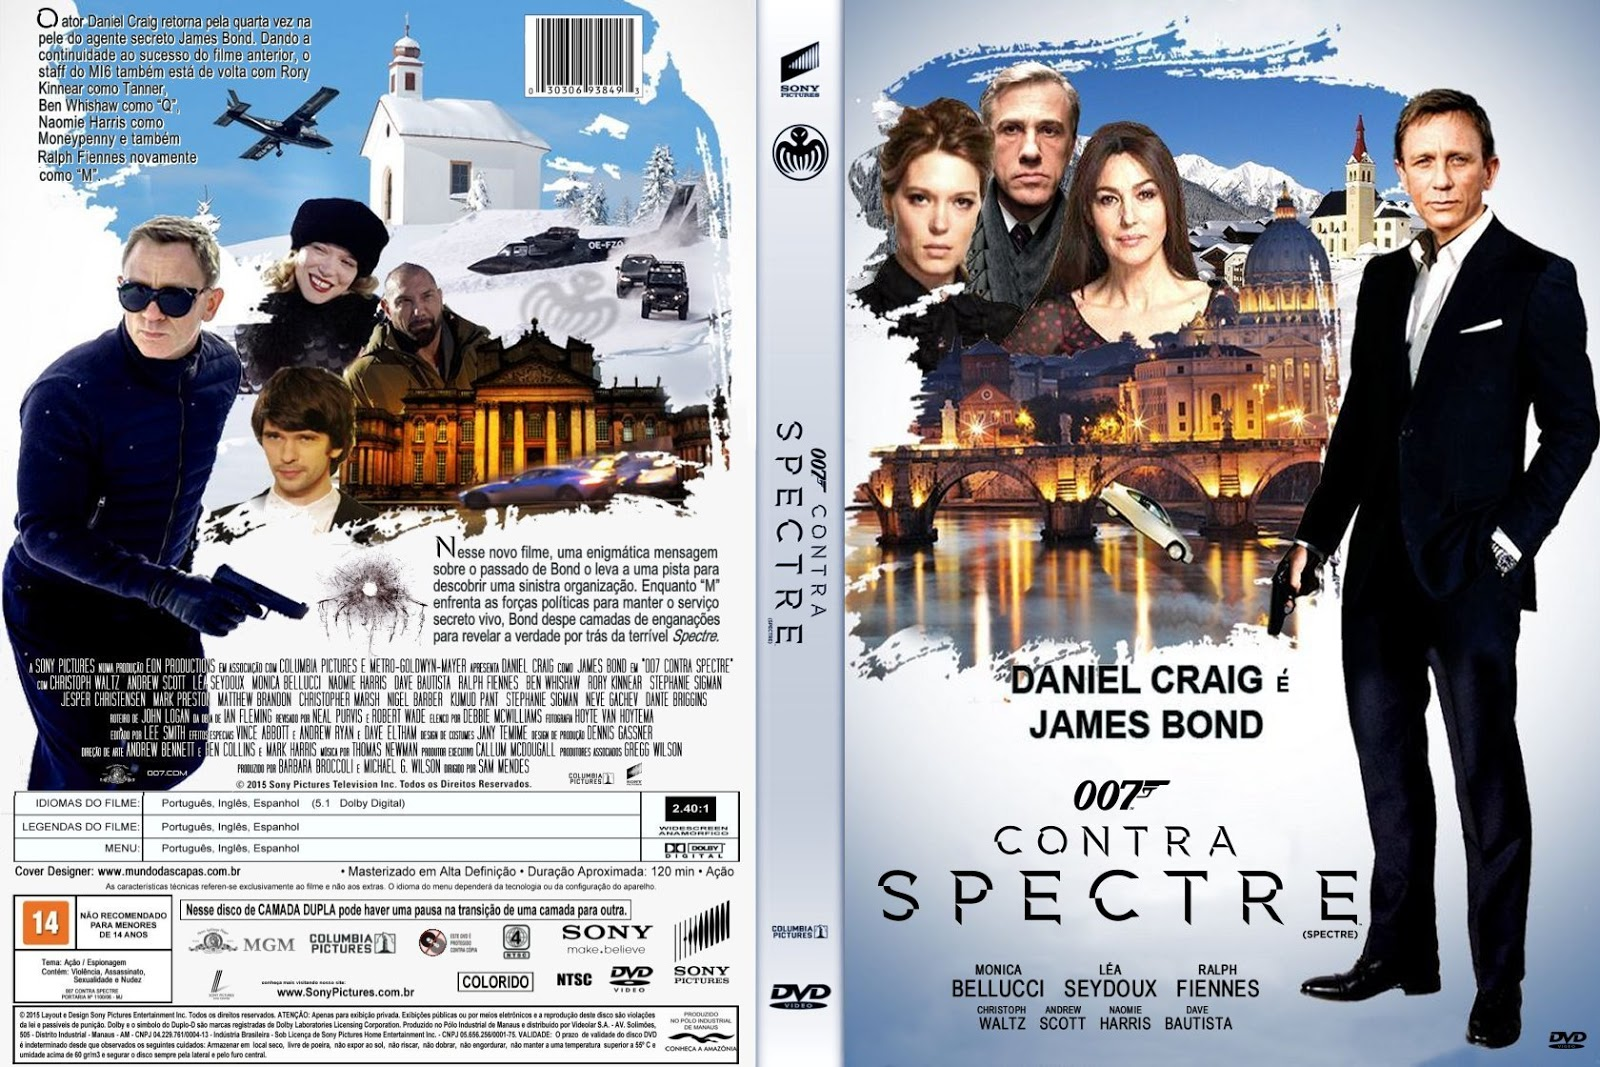 Download 007 Contra Spectre DVDRip XviD Dua Áudio 007 2BContra 2BSpectre